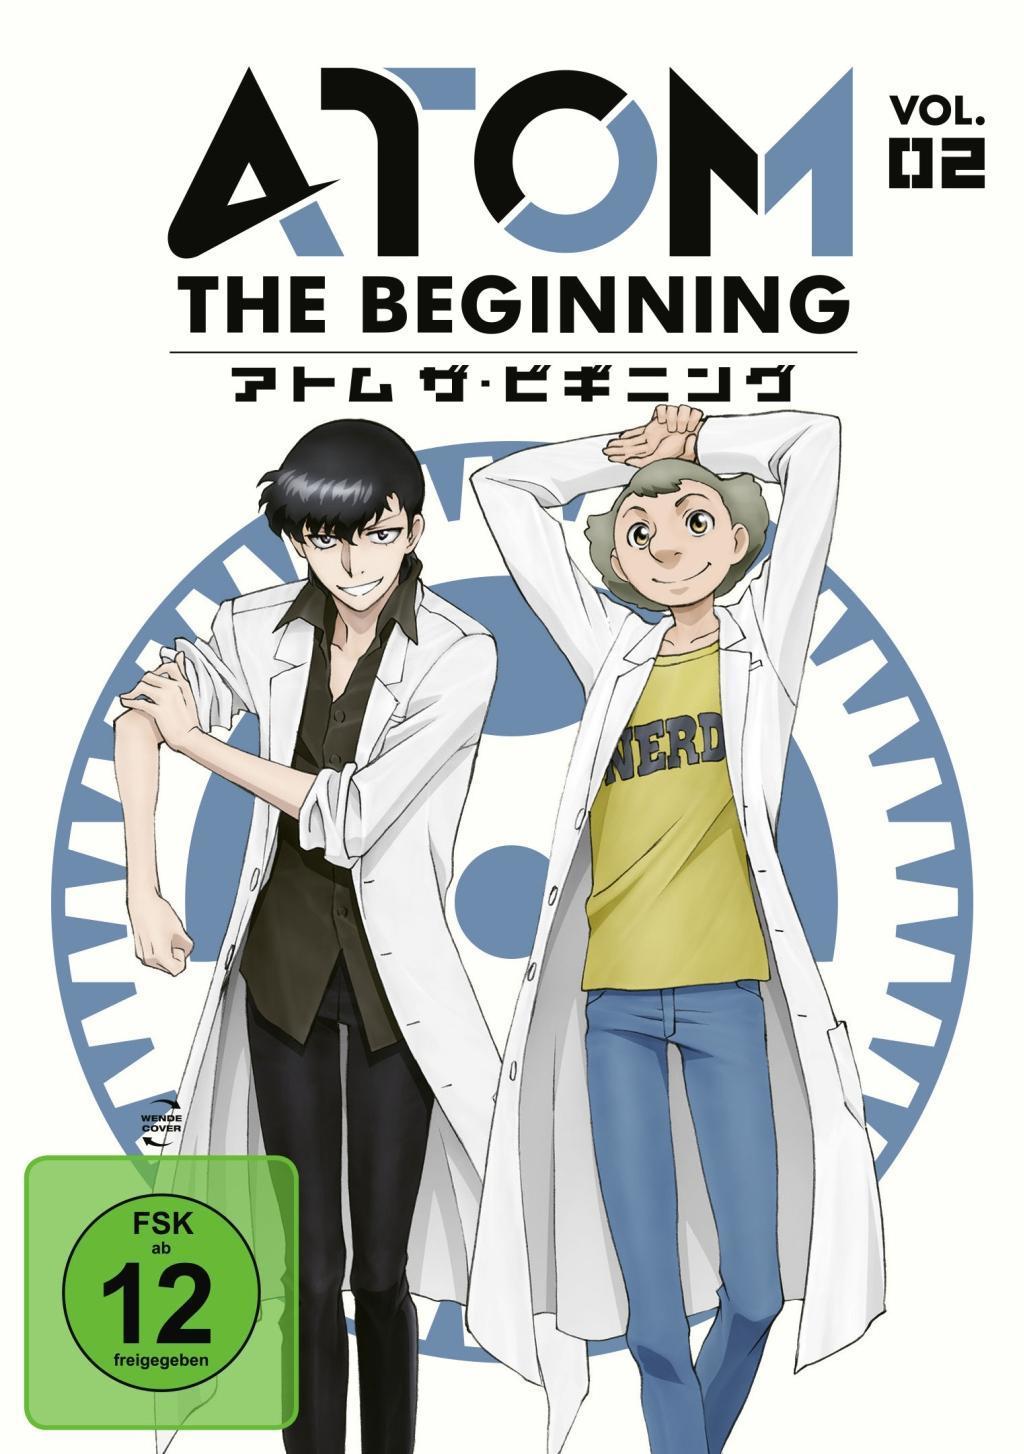 Atom the Beginning Vol. 2  Tatsuo Sato  DVD  Deutsch  2018